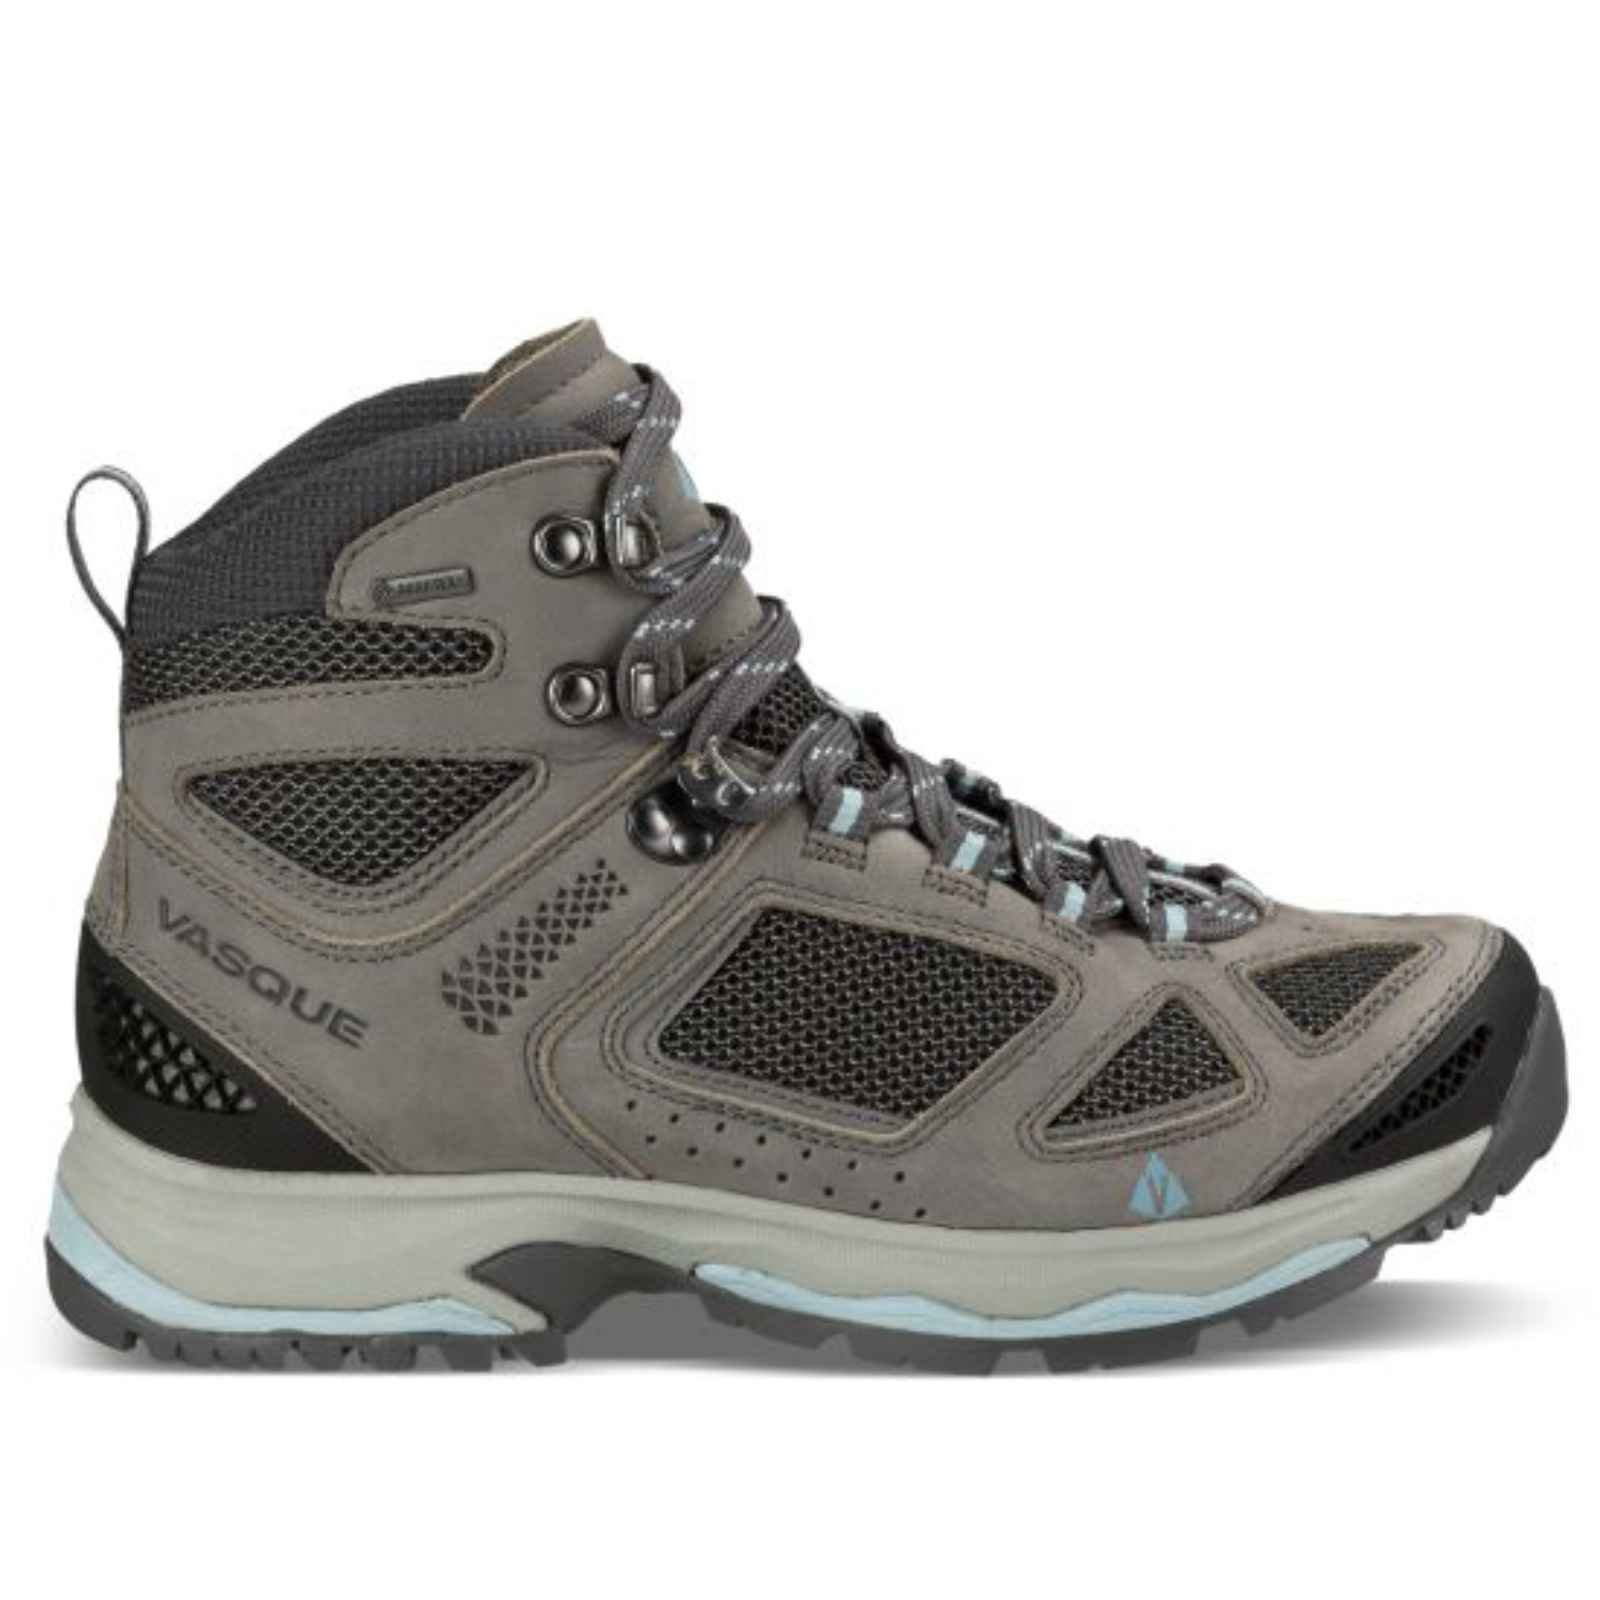 Vasque Women's Breeze III GTX Hiking Boots, Wide, Gargoyle/Stone Blue Black 9